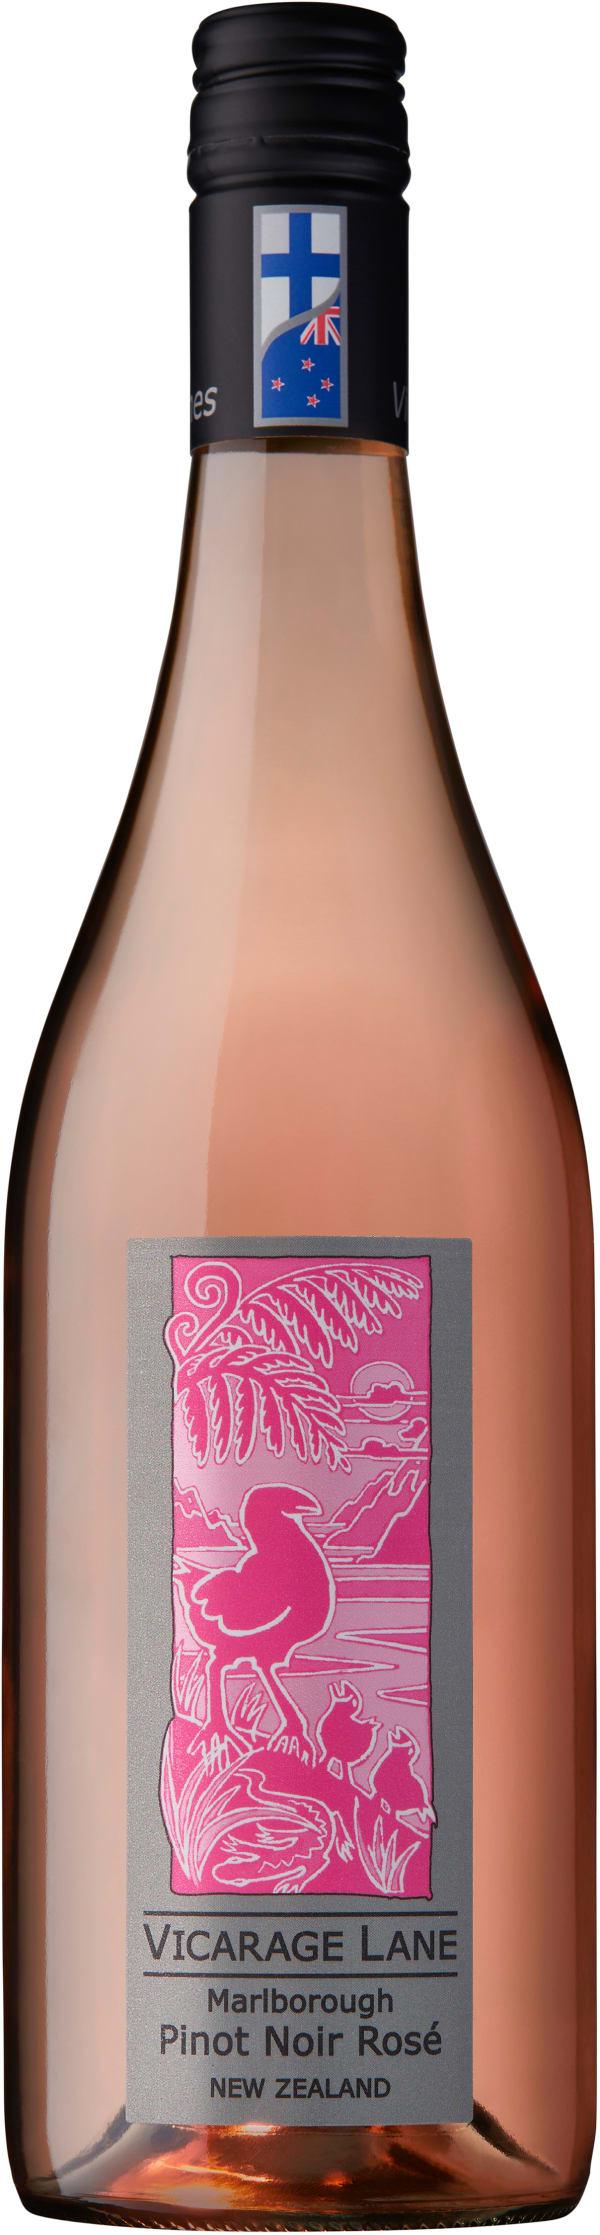 Vicarage Lane Canterbury Pinot Noir Rosé 2018